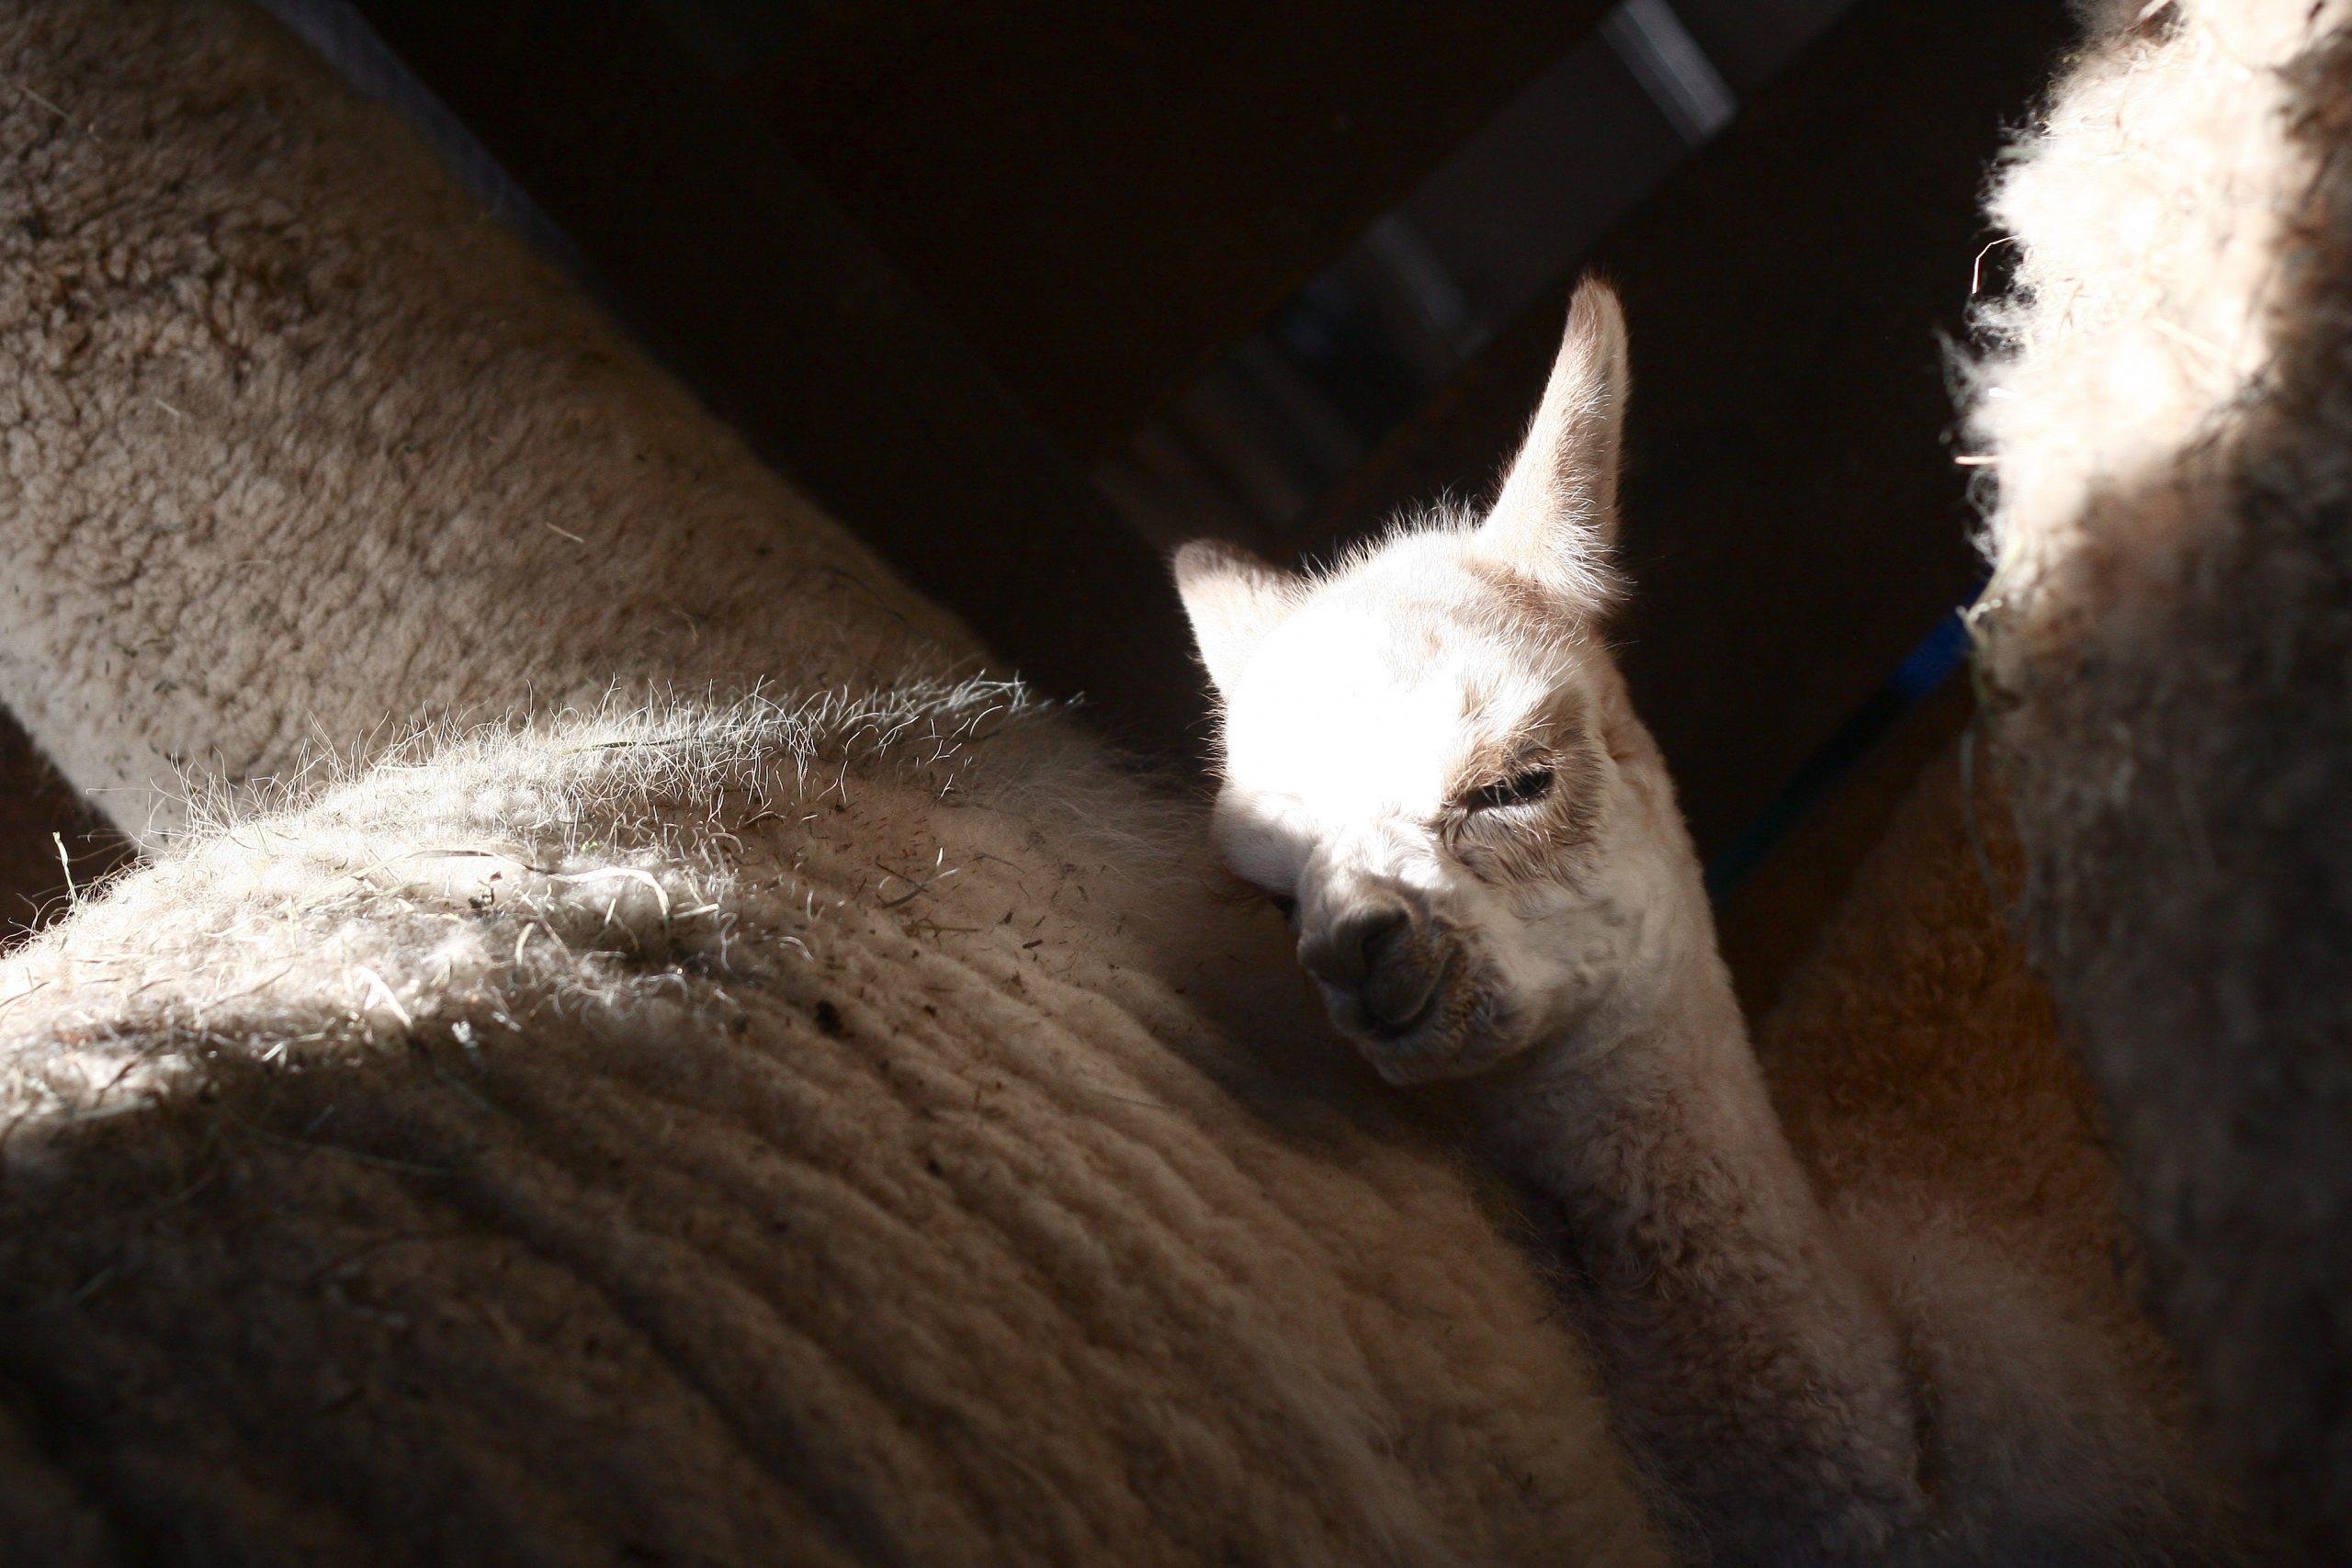 Baby and Mama Alpaca